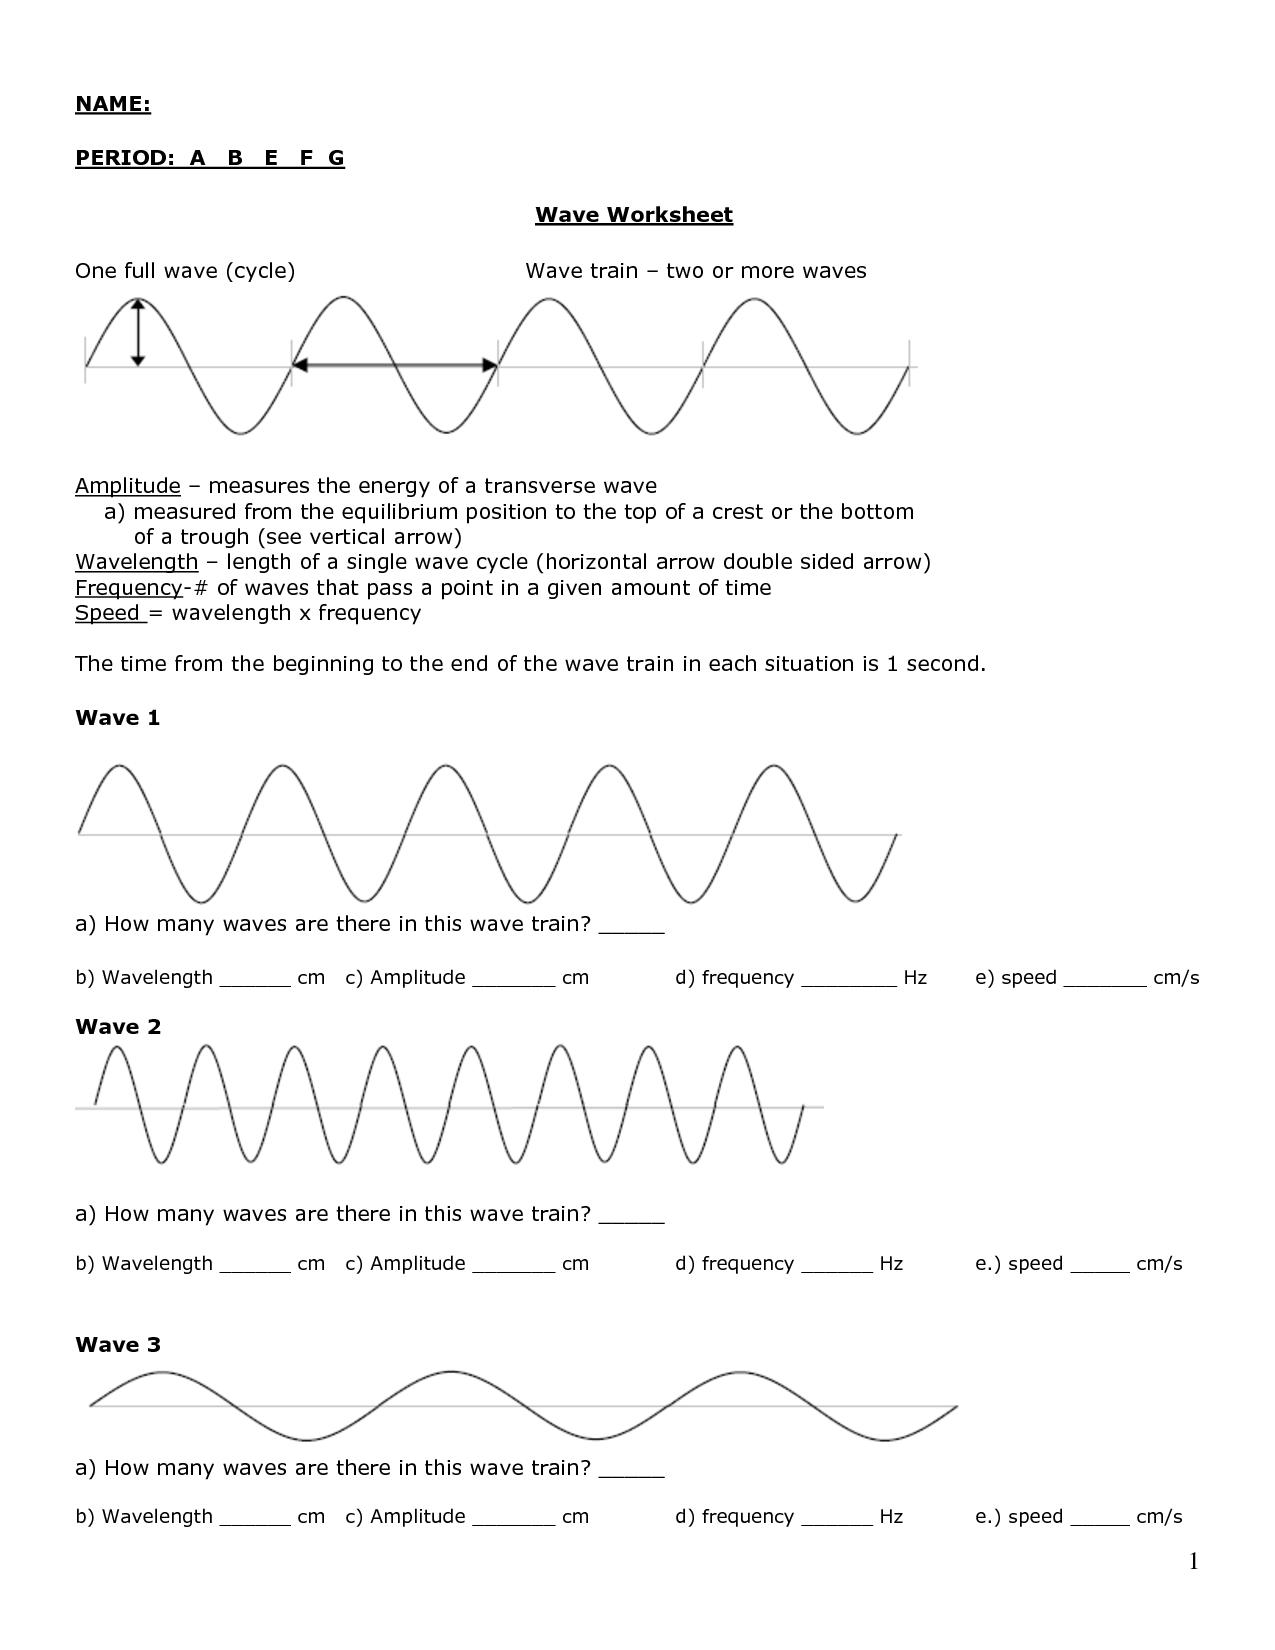 12 Best Images Of Labeling Waves Worksheet Answer Key 1 17